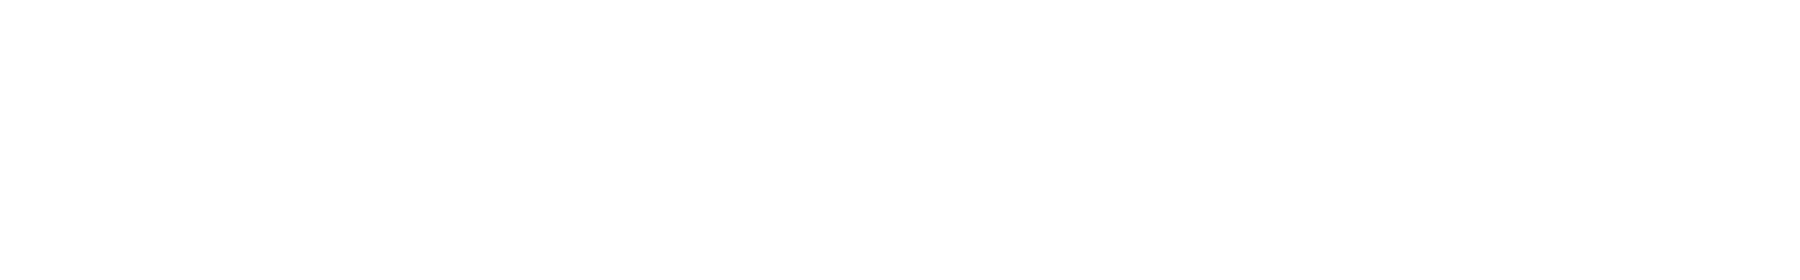 ehu basslp 125 036 gb